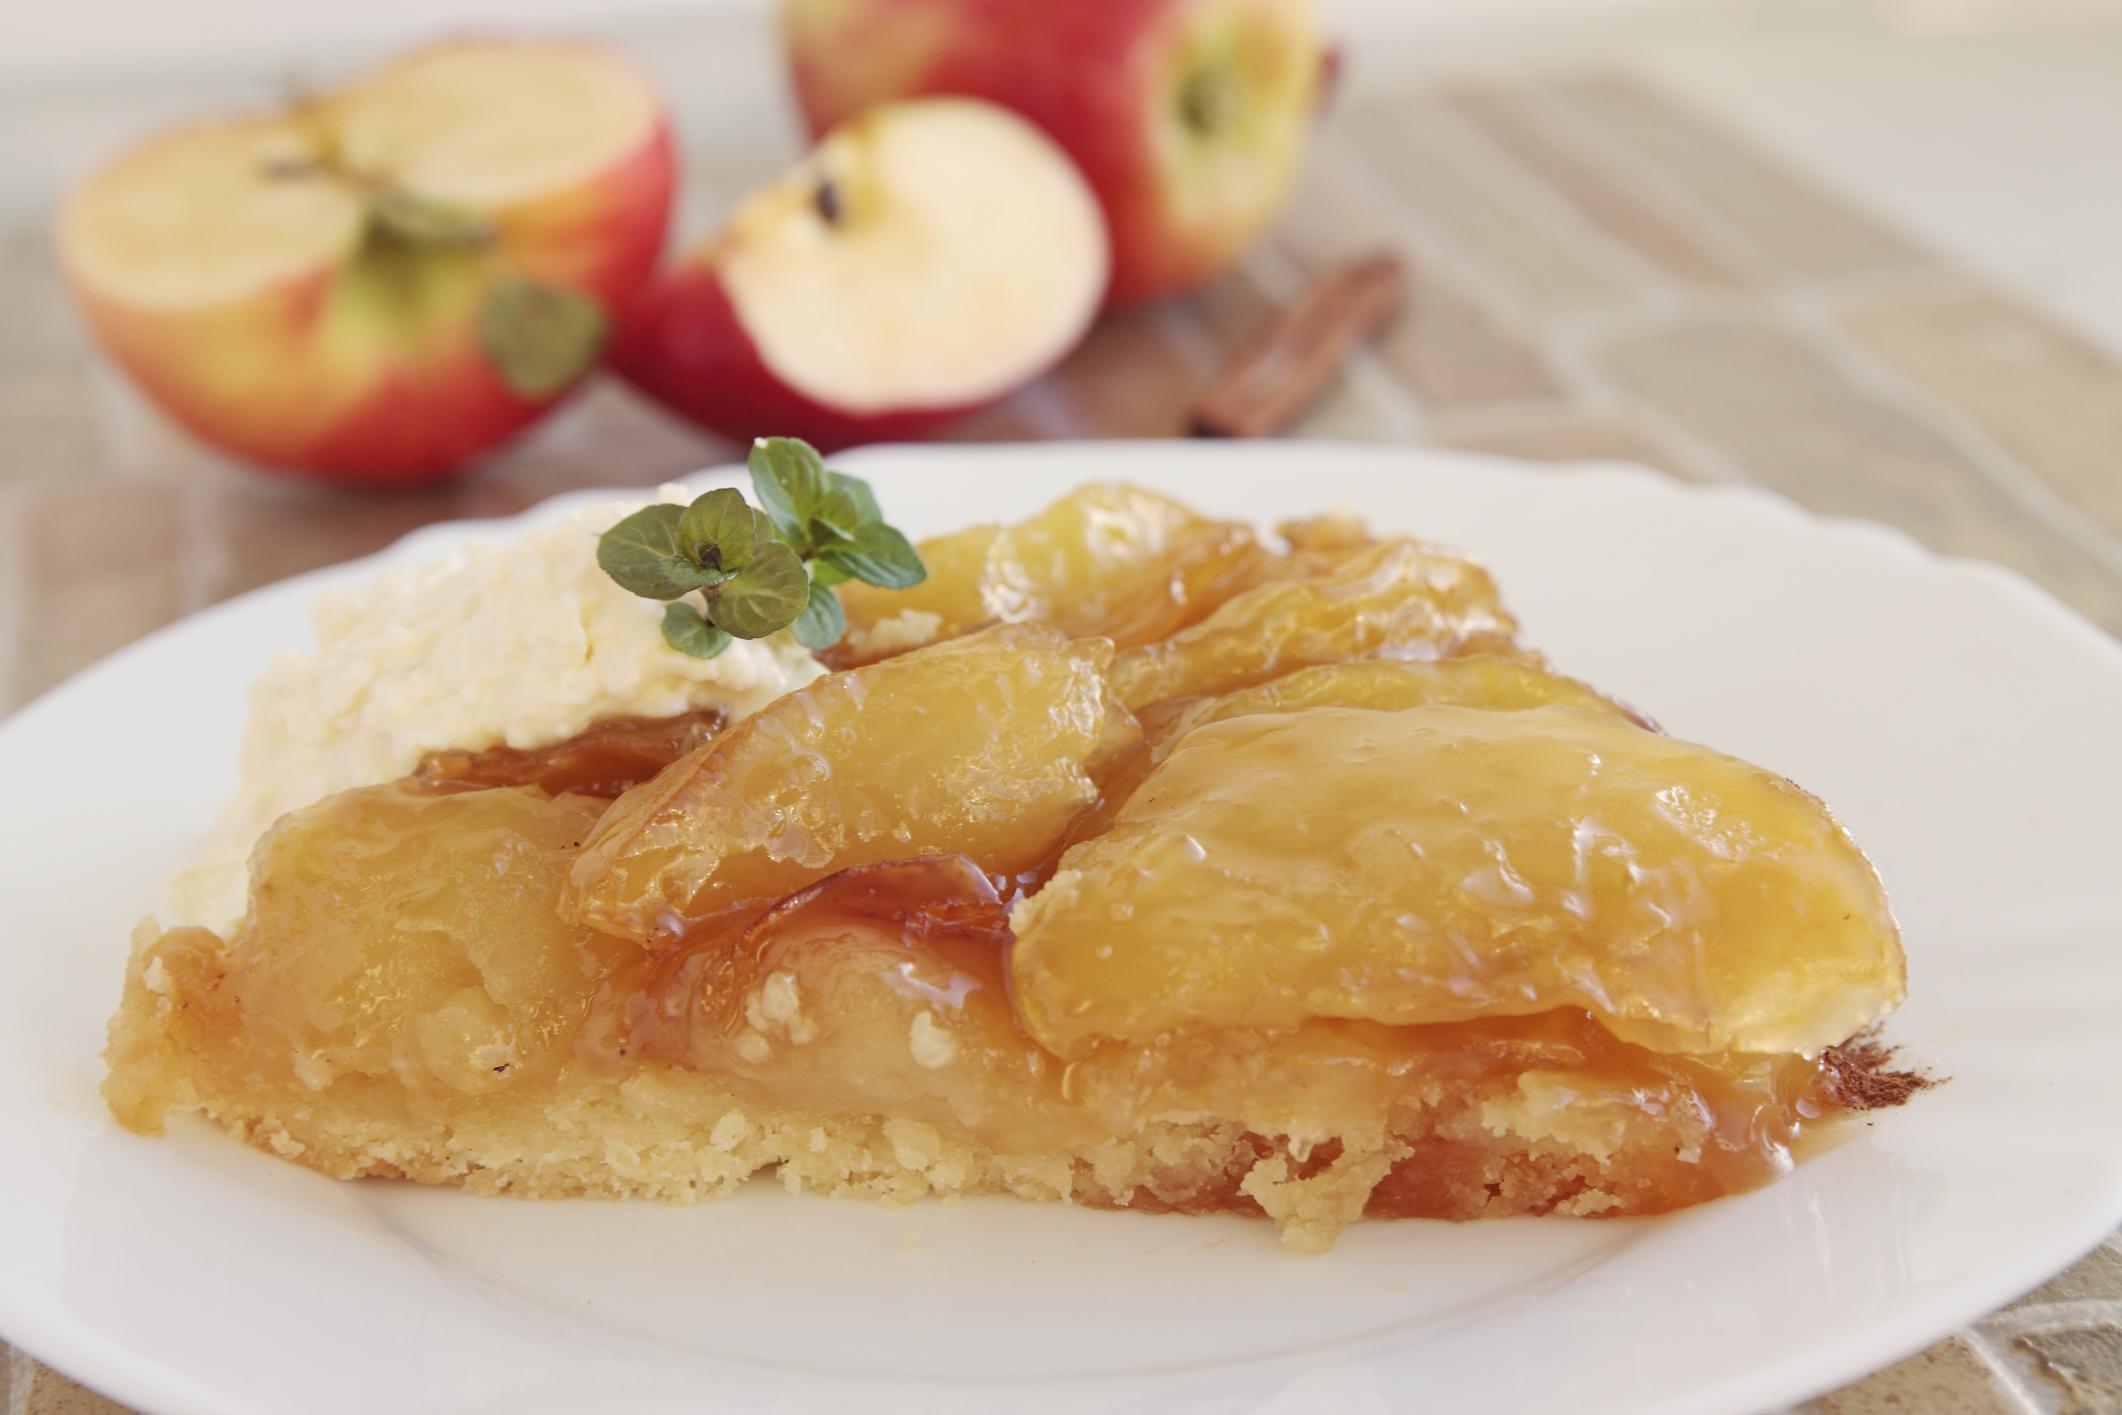 Tarta de manzana invertida con crema de leche